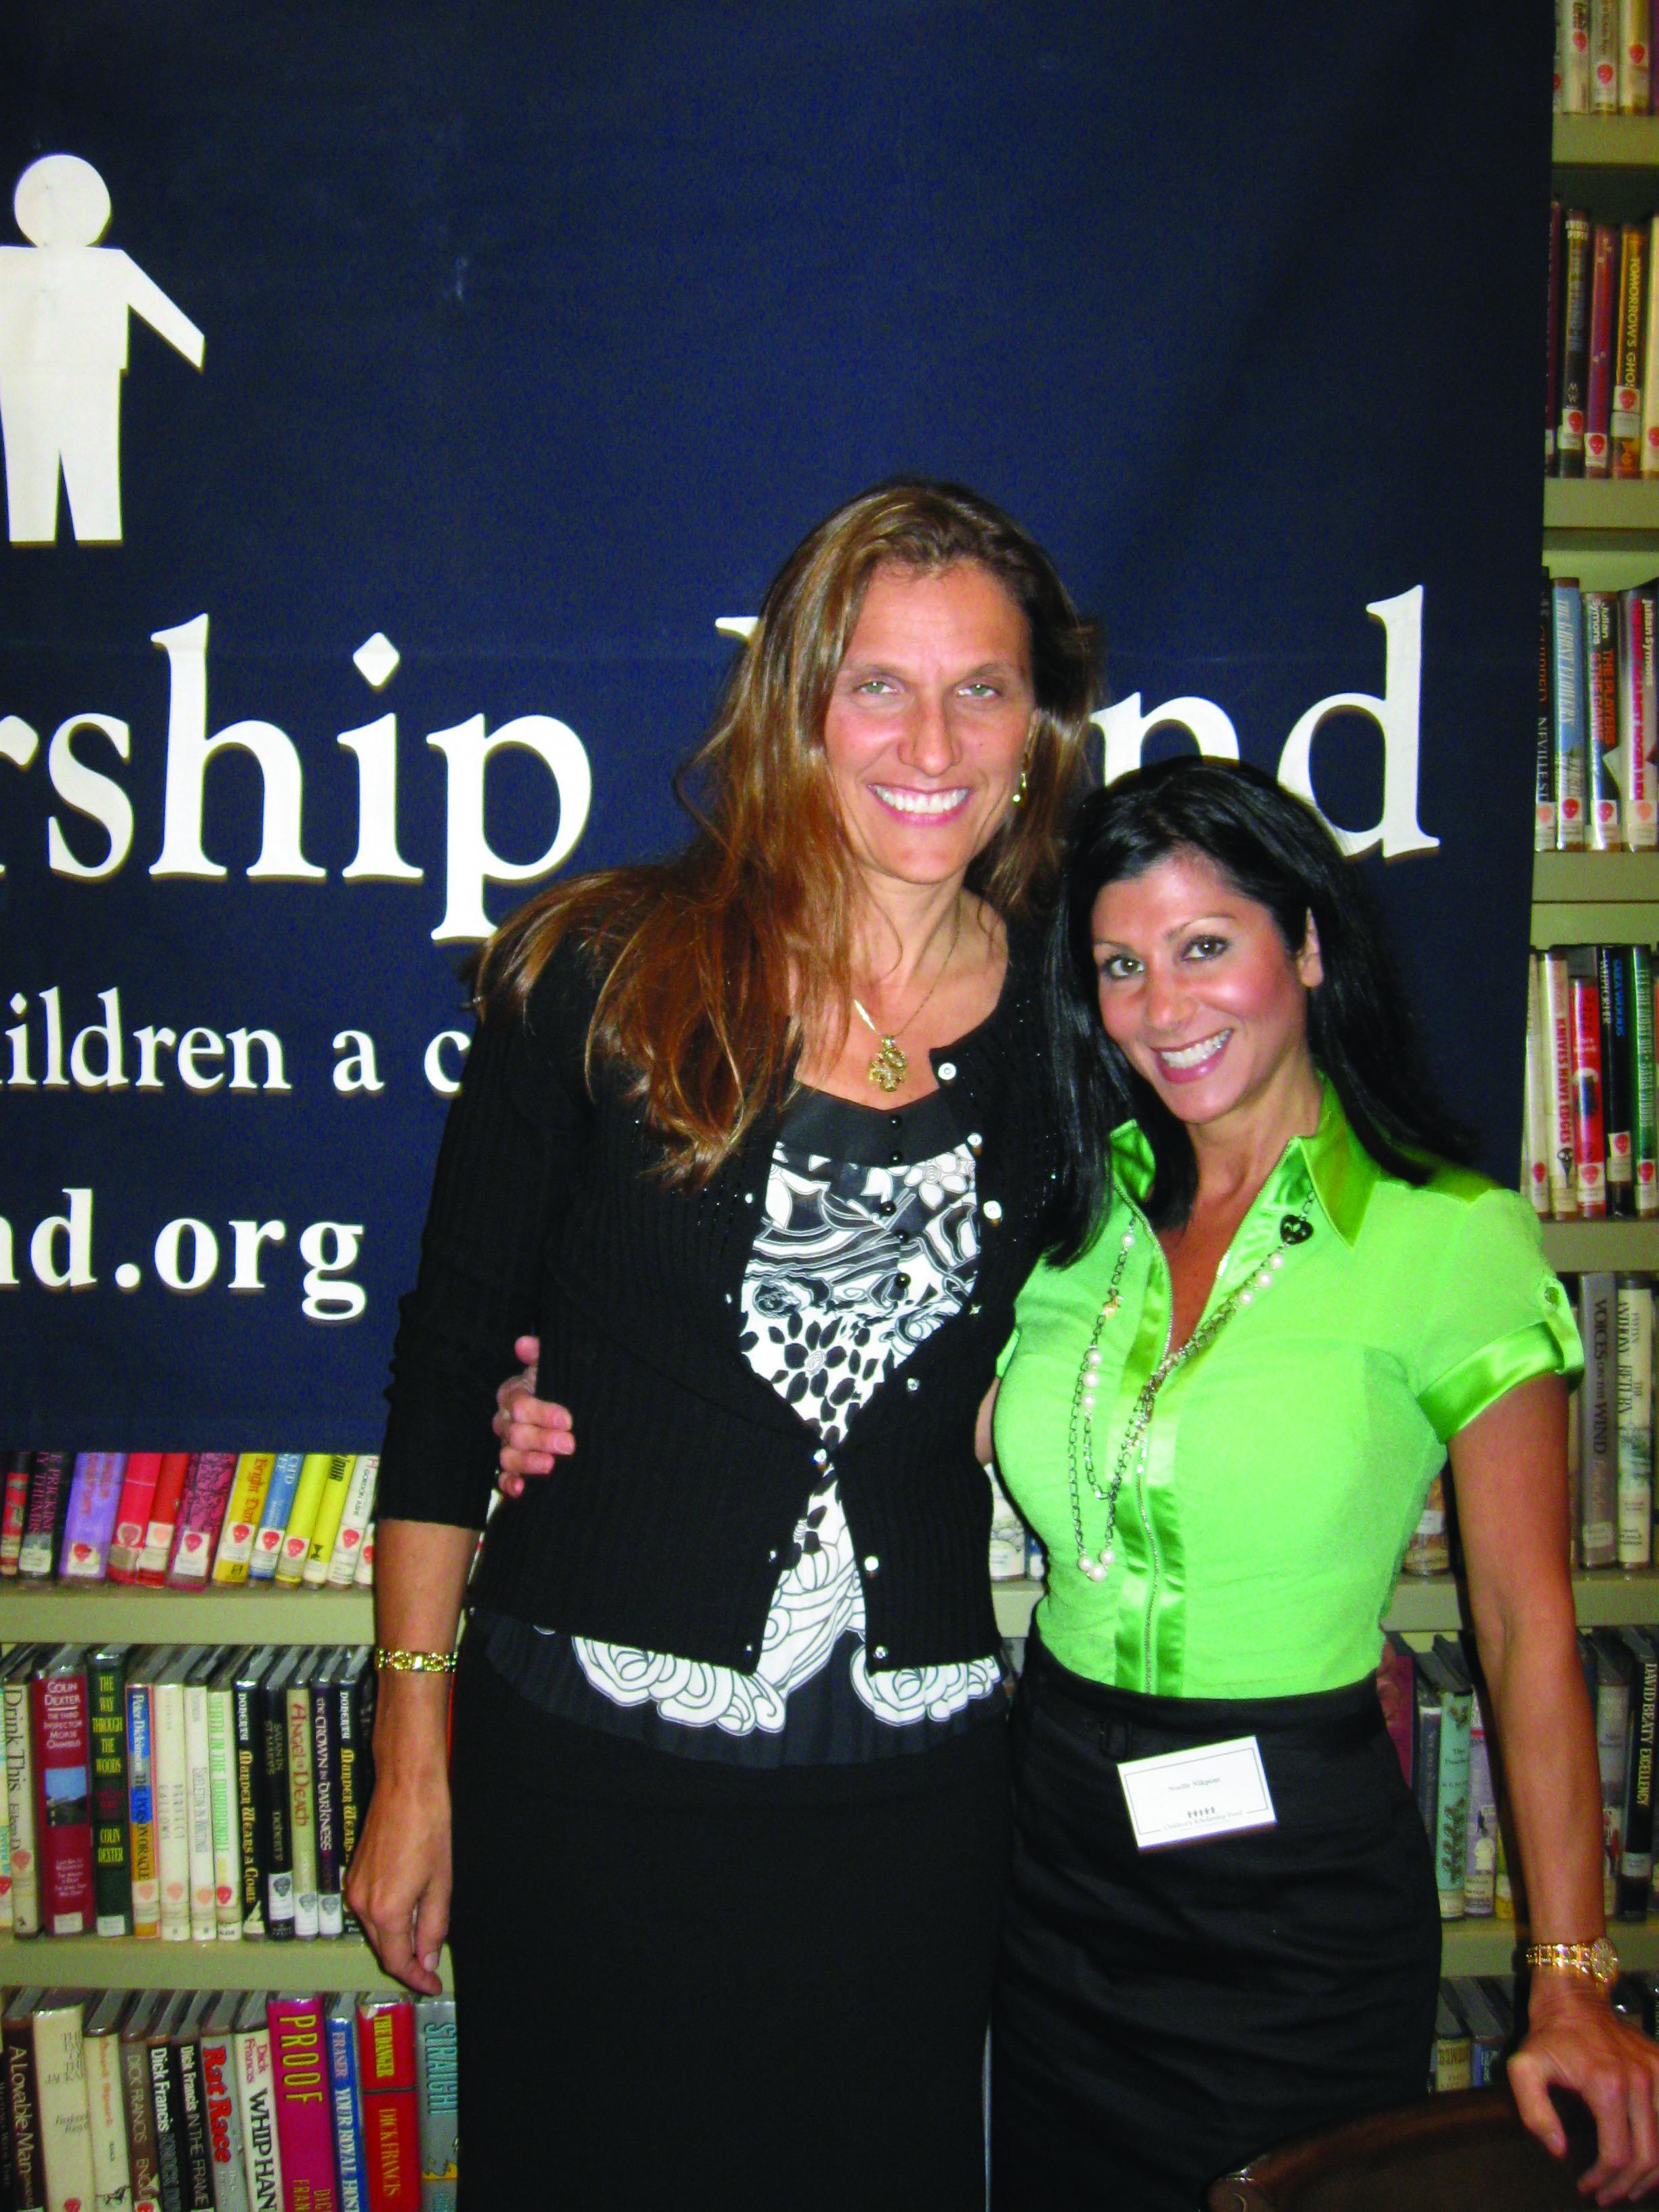 CSF President, Darla Romfo, and Board Member, Noelle Nikpour